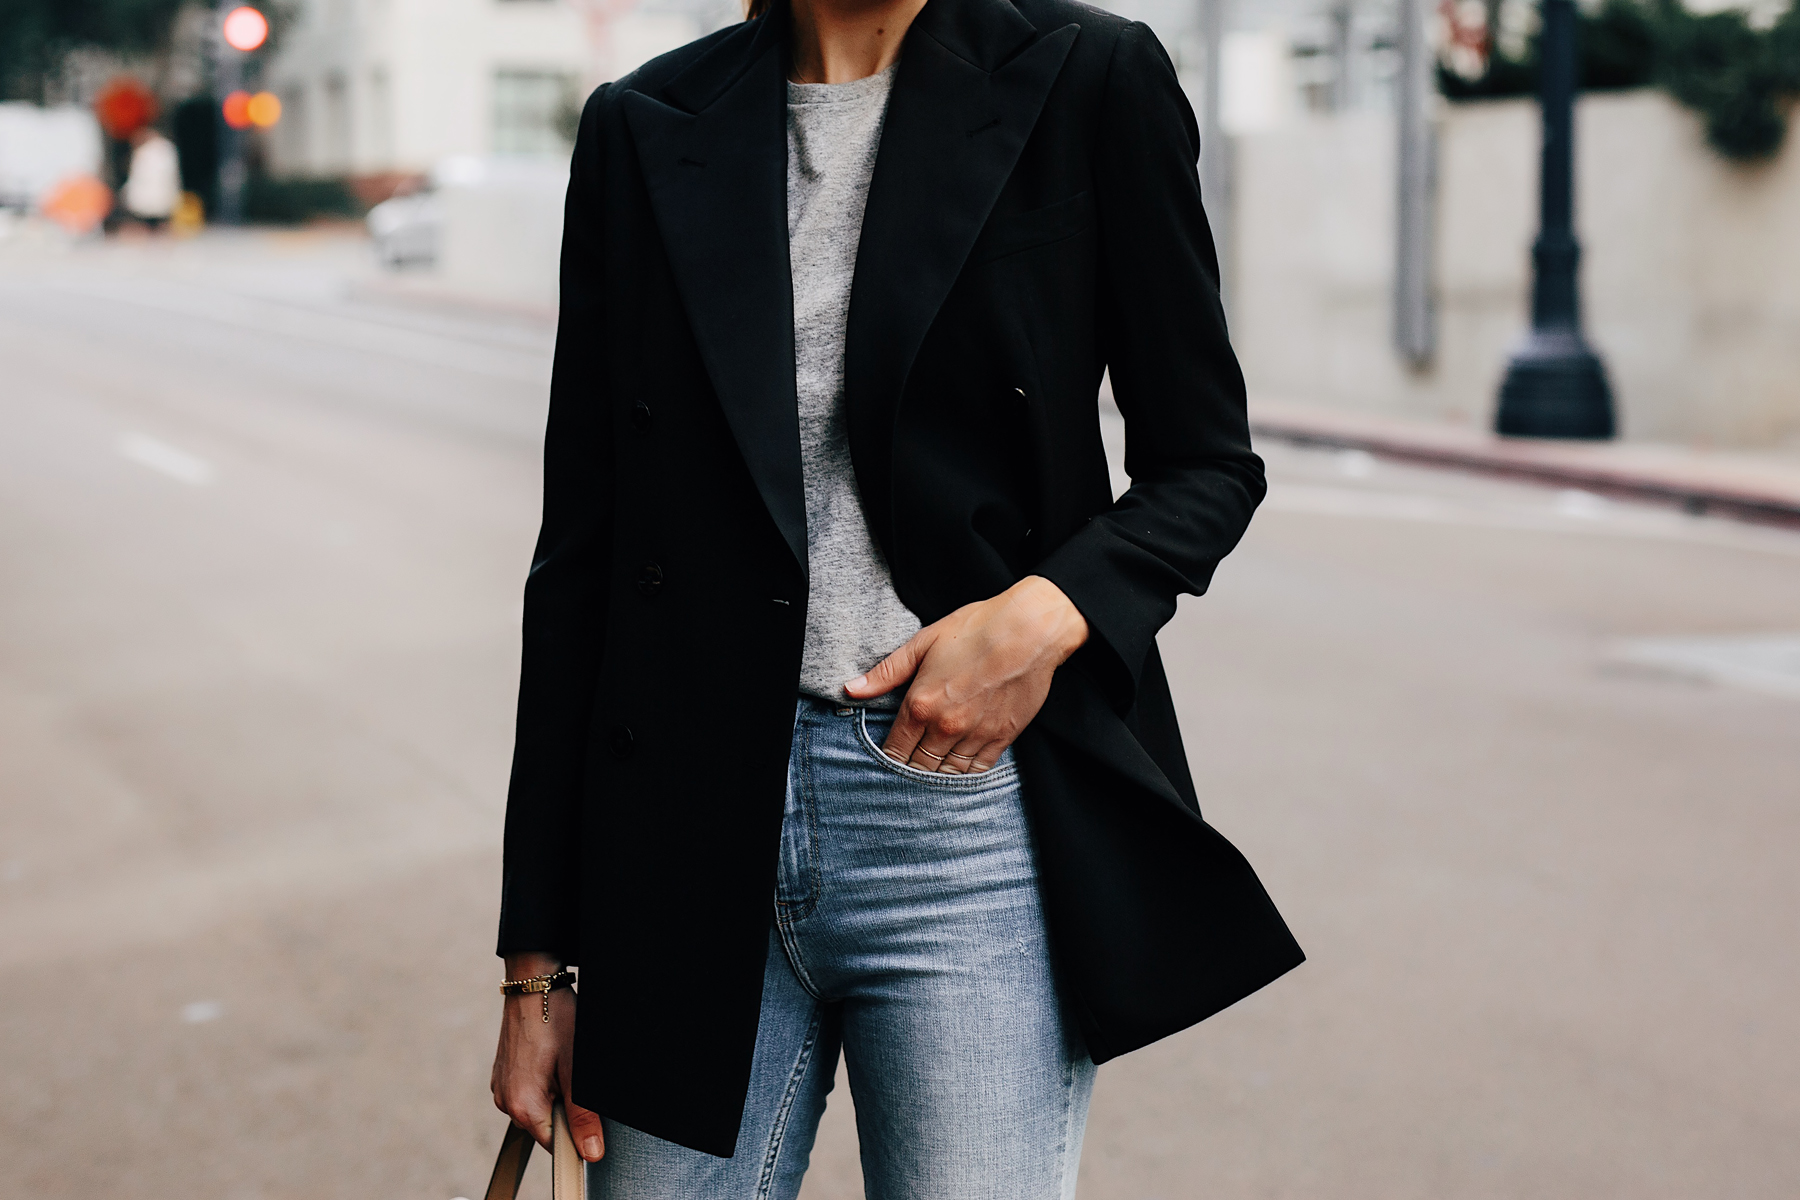 Woman Wearing Ralph Lauren Polo Black Blazer Grey Tshirt Jeans Outfit Fashion Jackson San Diego Fashion Blogger Street Style